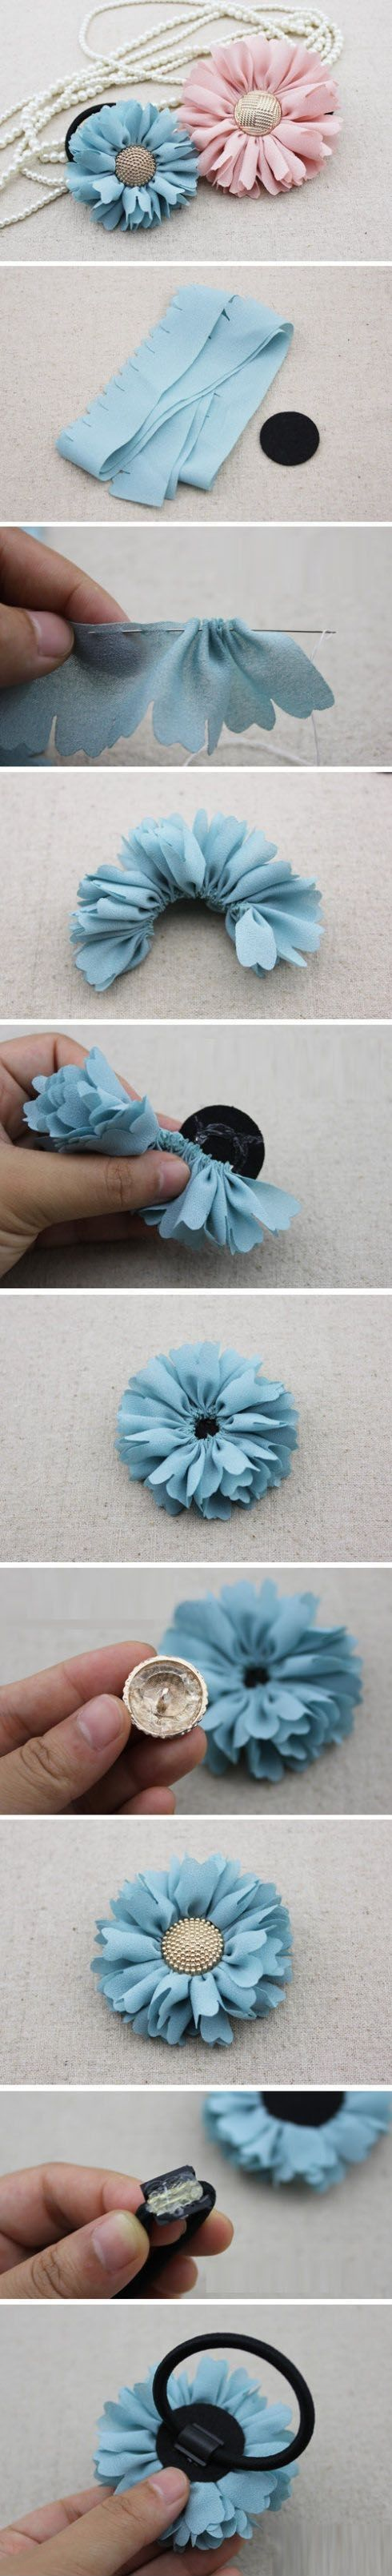 fabriquer elastique cheveux tuto diy: